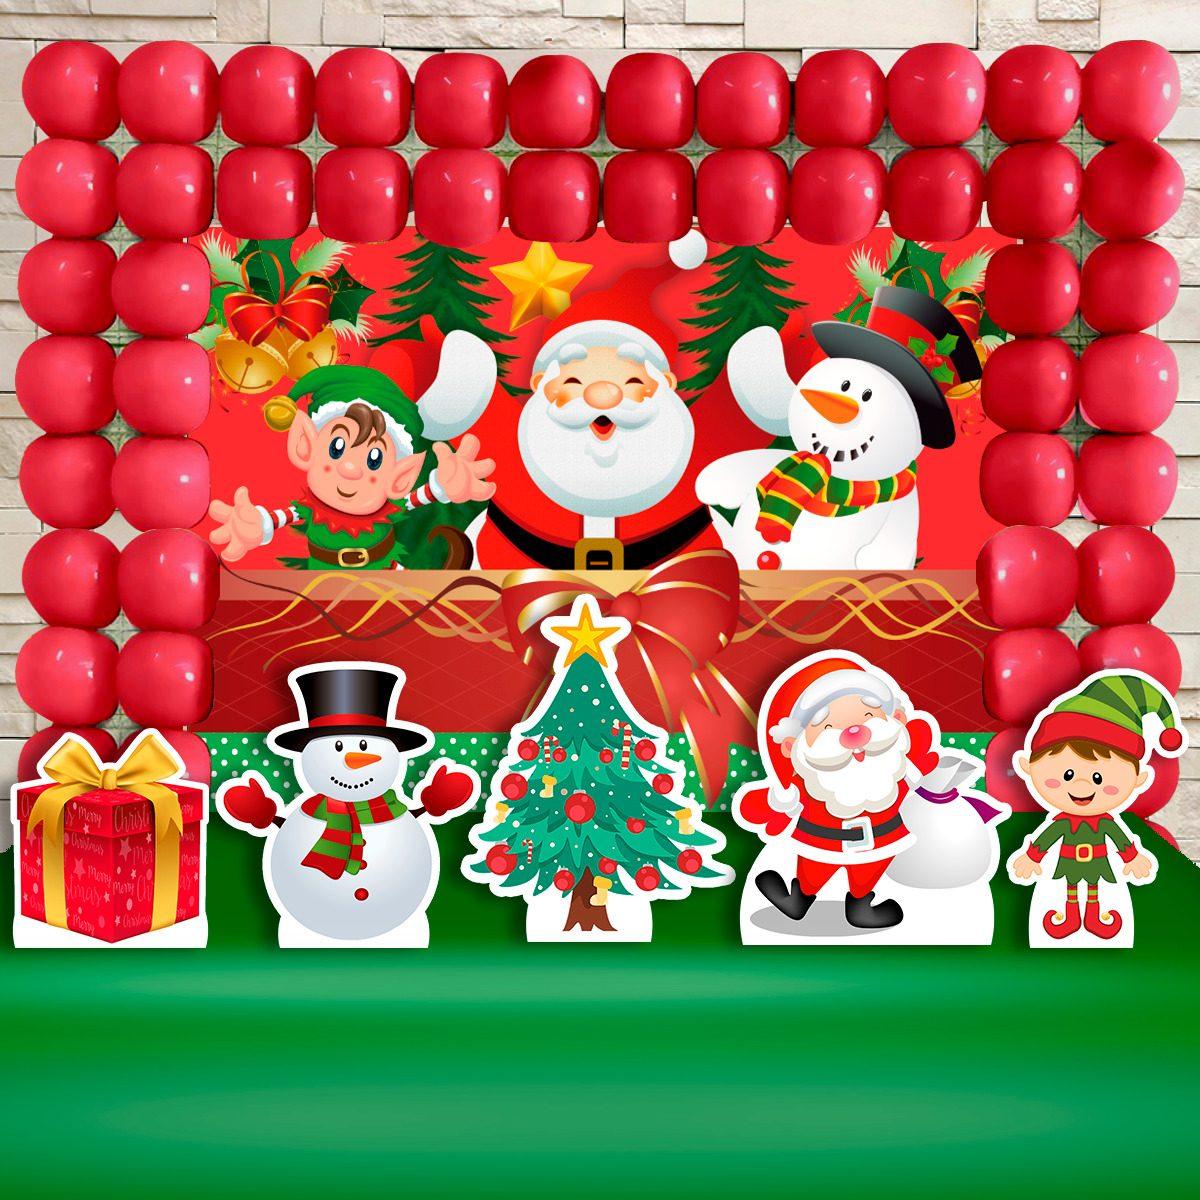 Kit Decoracao Festa Infantil Natal Papai Noel Frete Gratis R